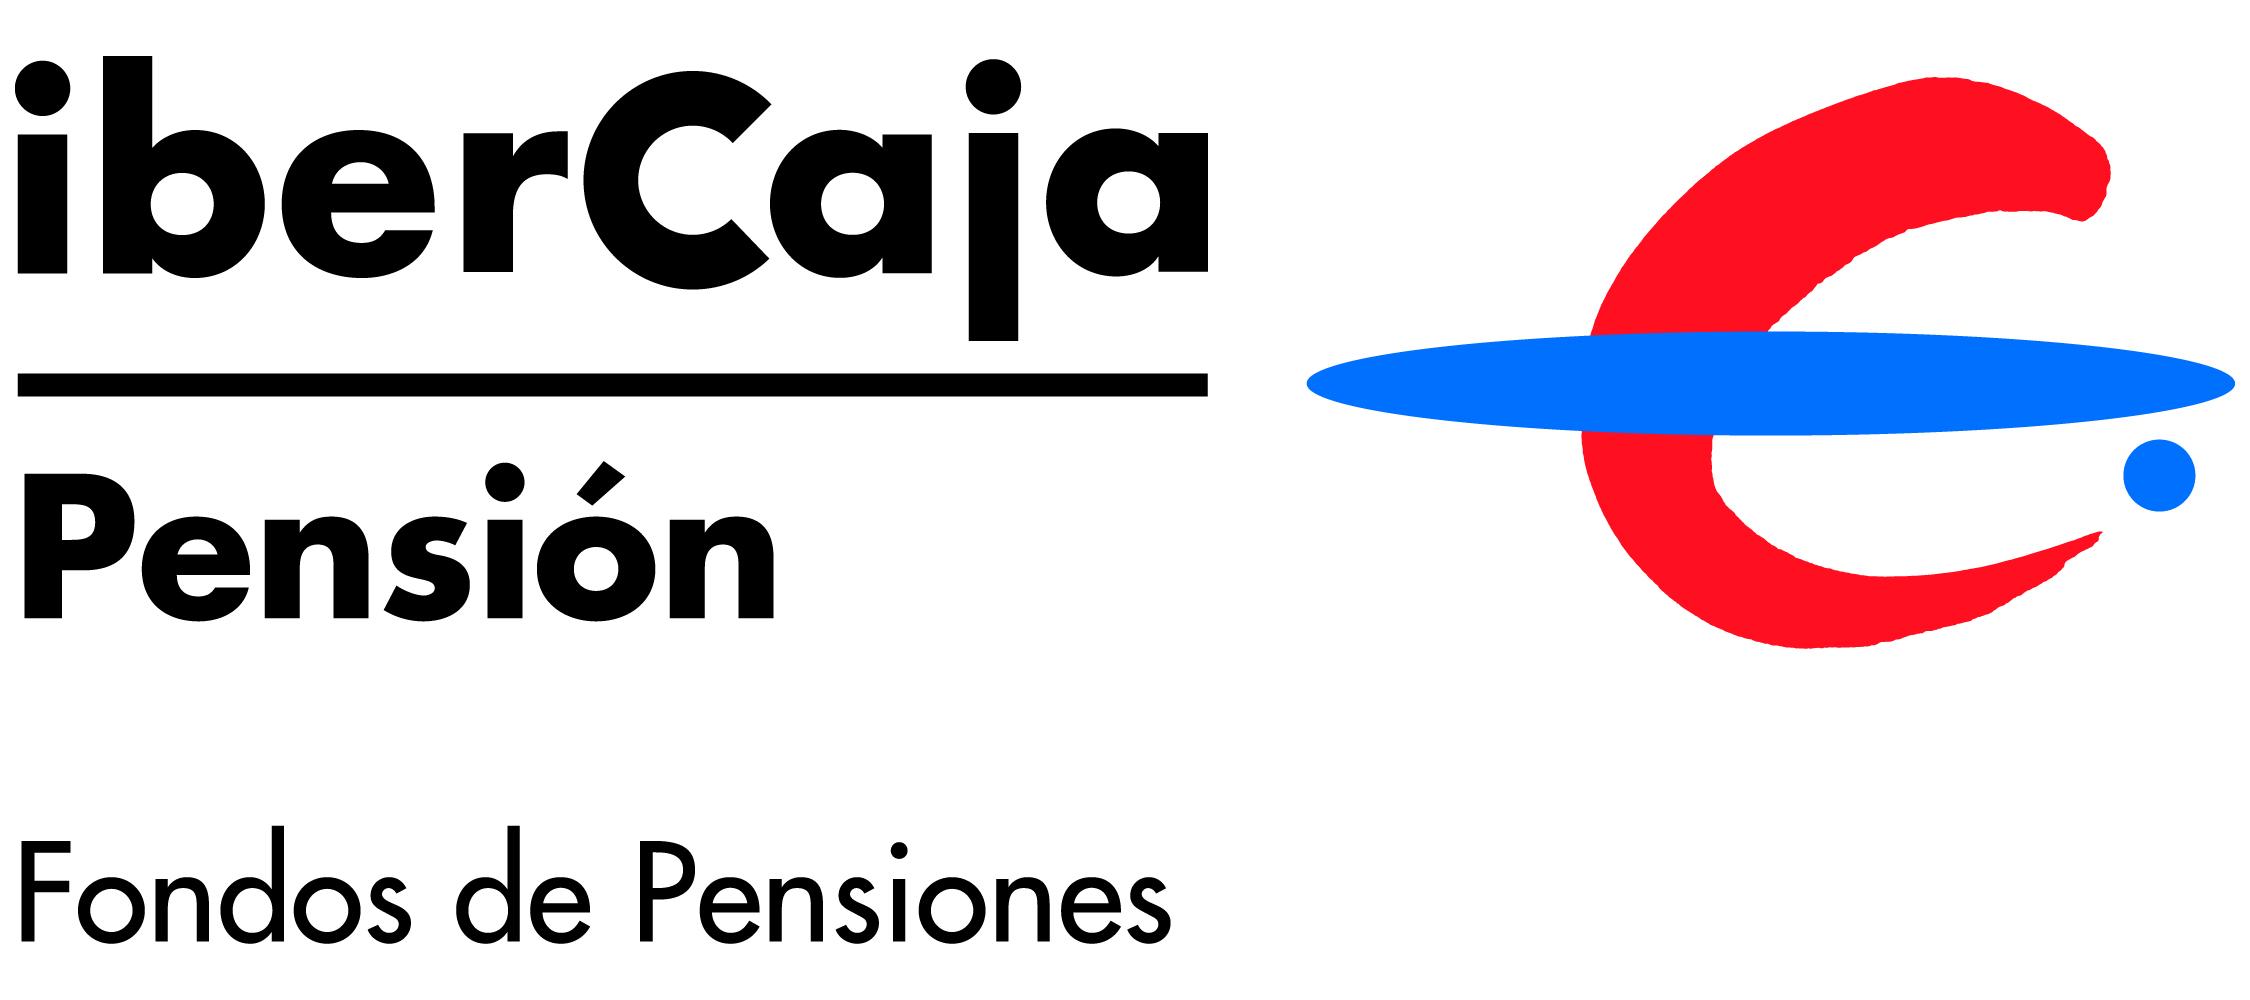 IBERCAJA PENSION, S.A.U, E.G.F.P.